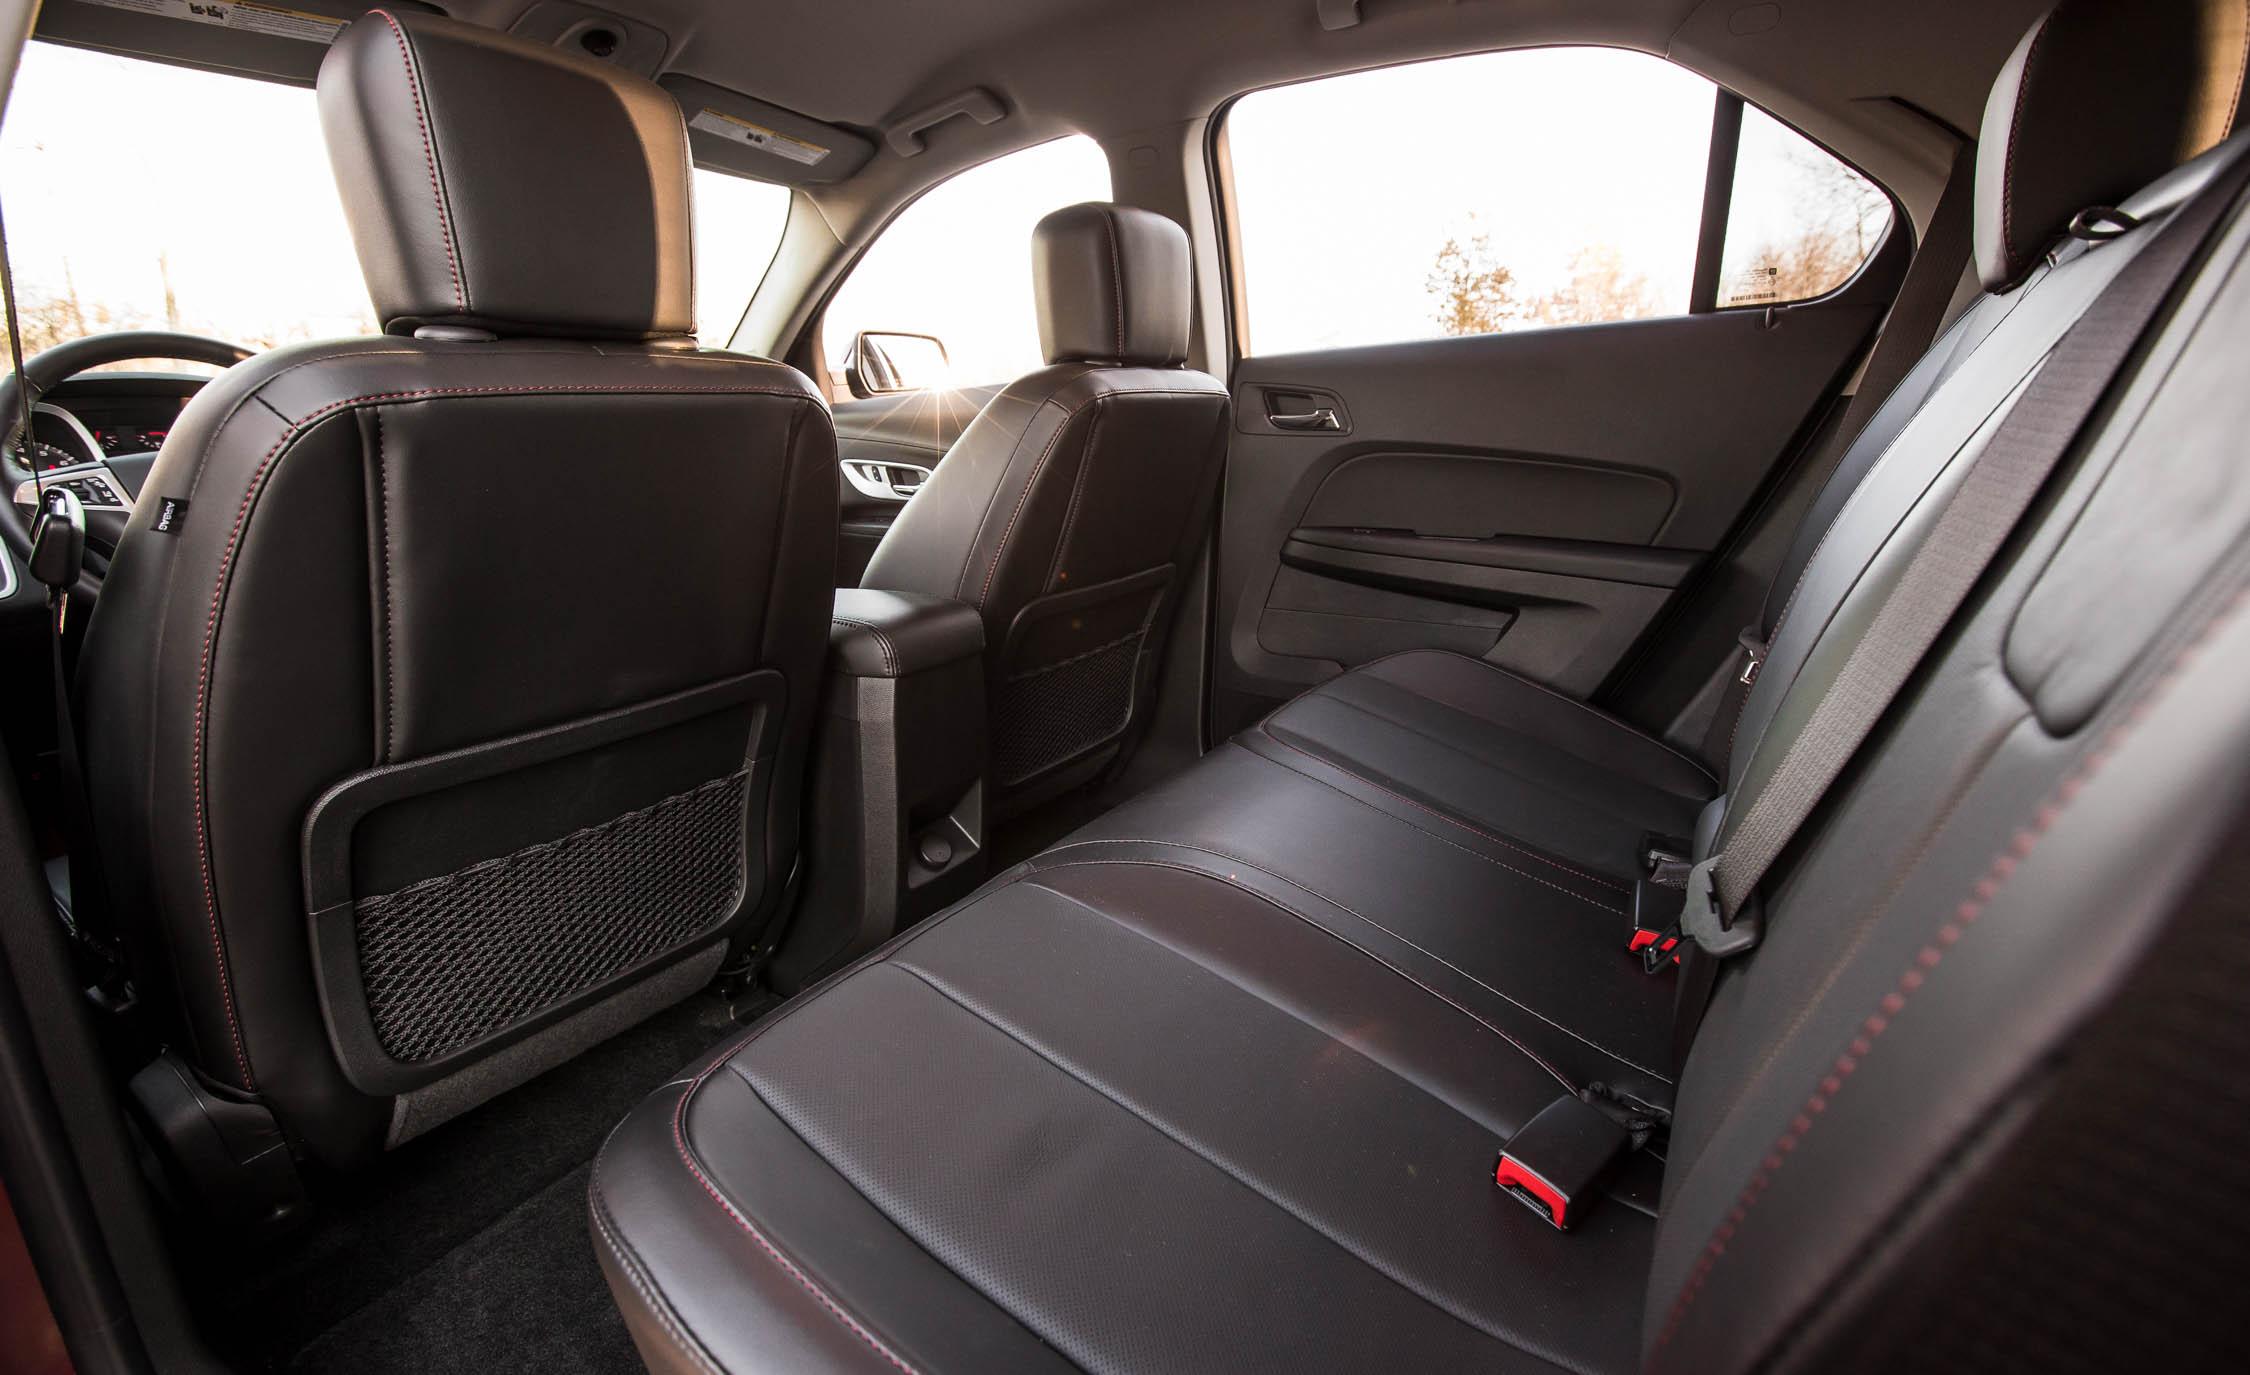 2016 Chevrolet Equinox LTZ (Photo 8 of 25)